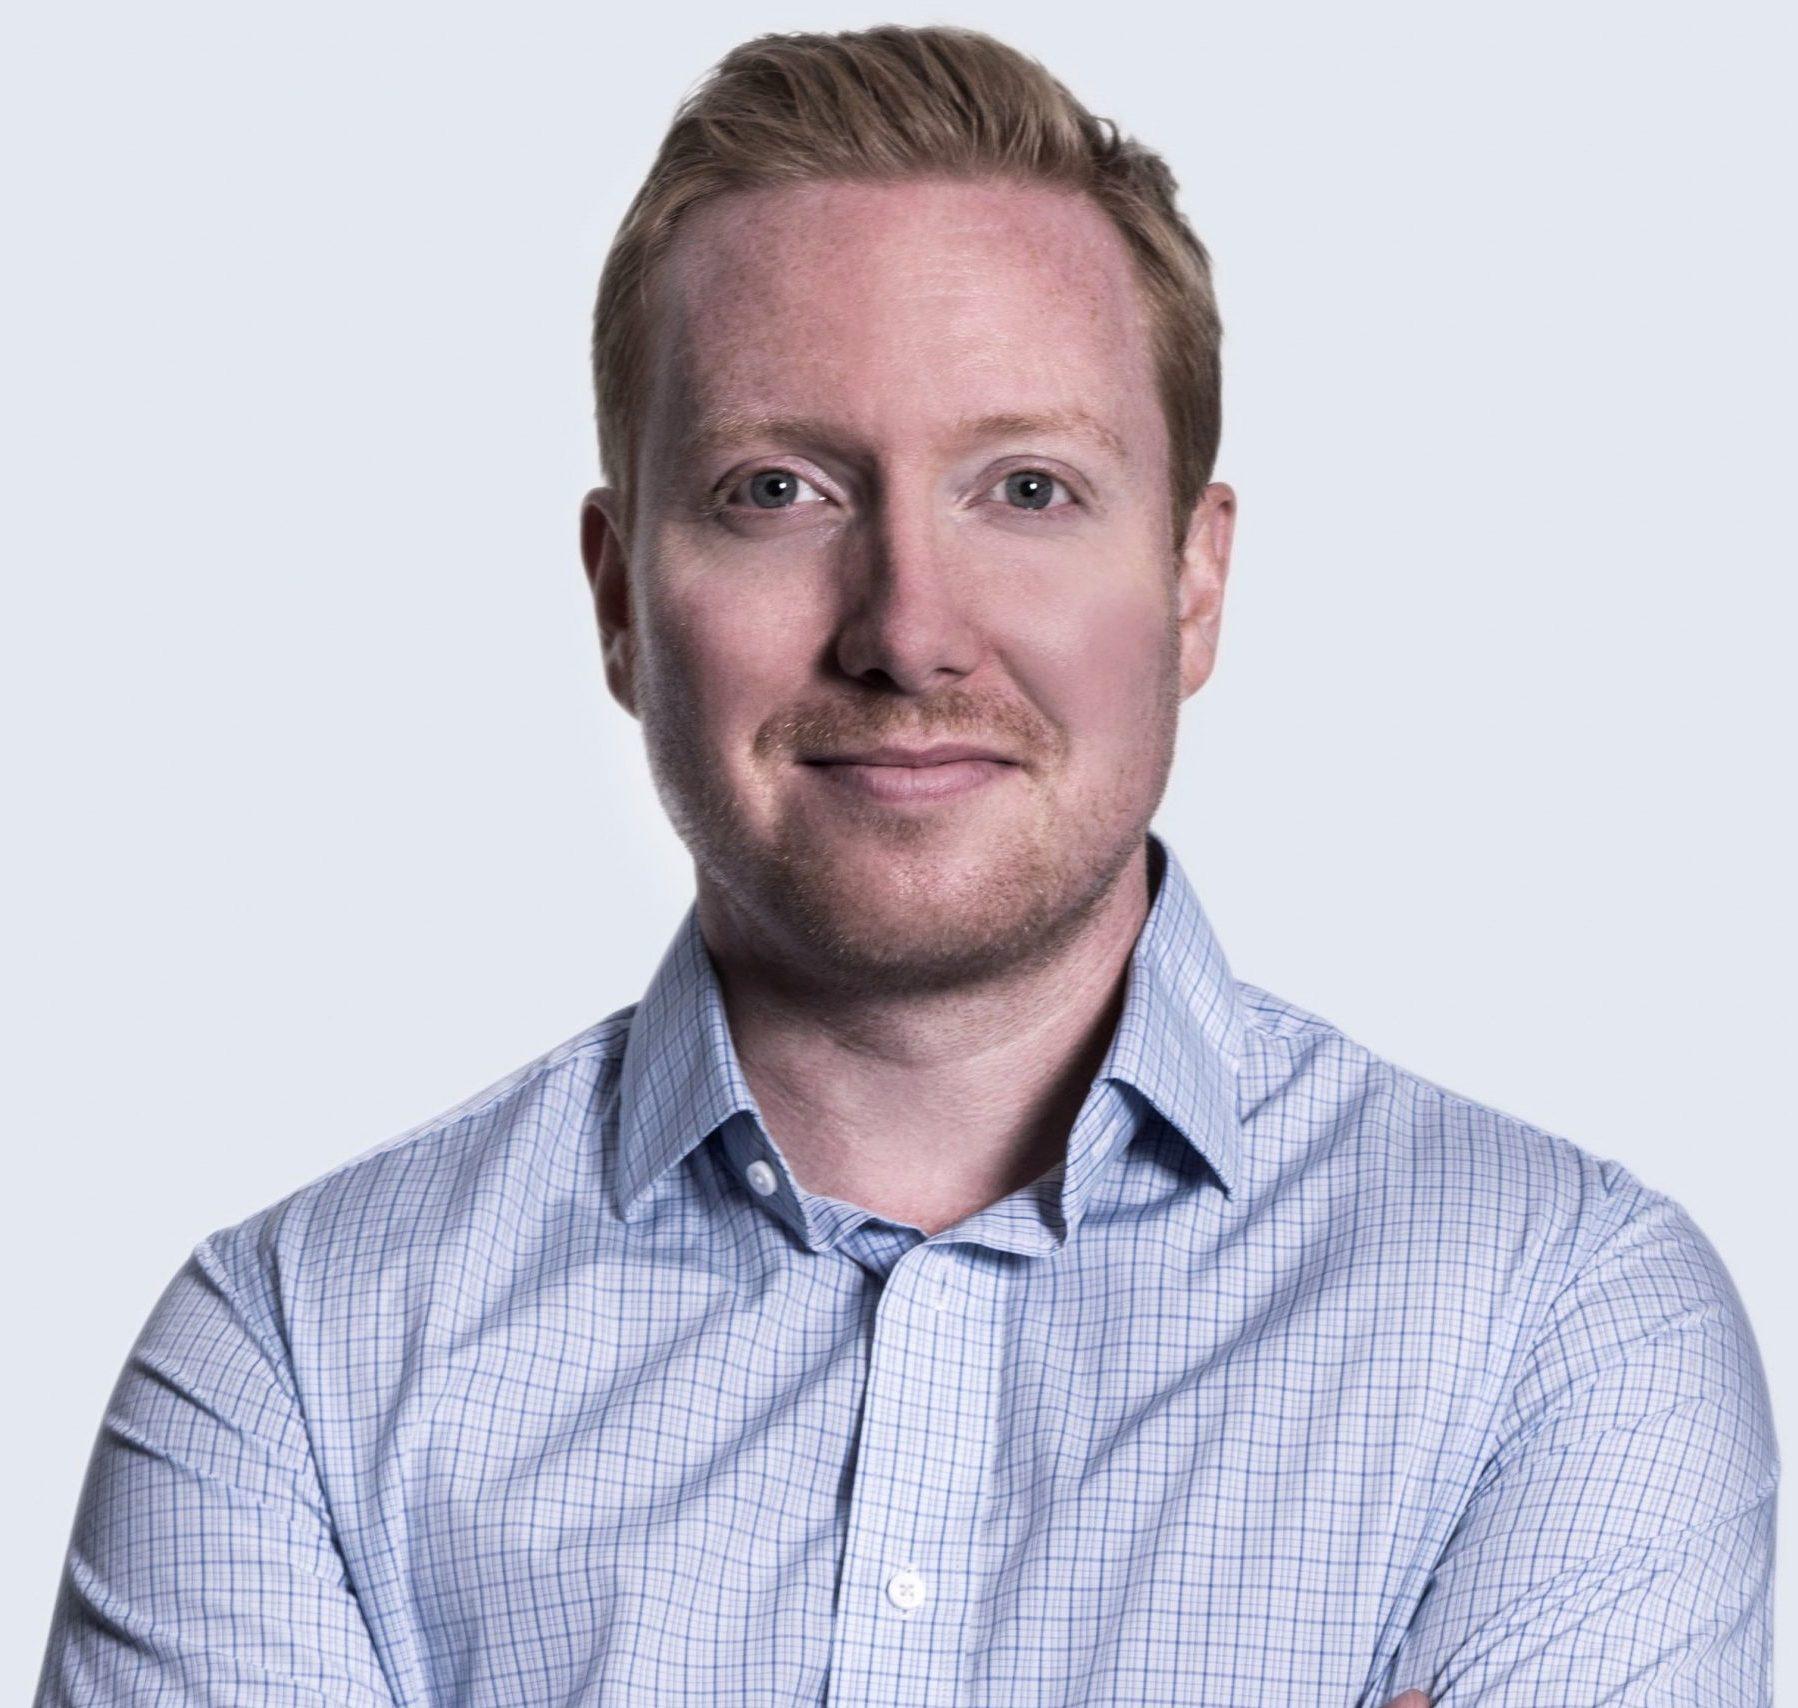 Paul Gaudette, Co-Founder - Dig Insights